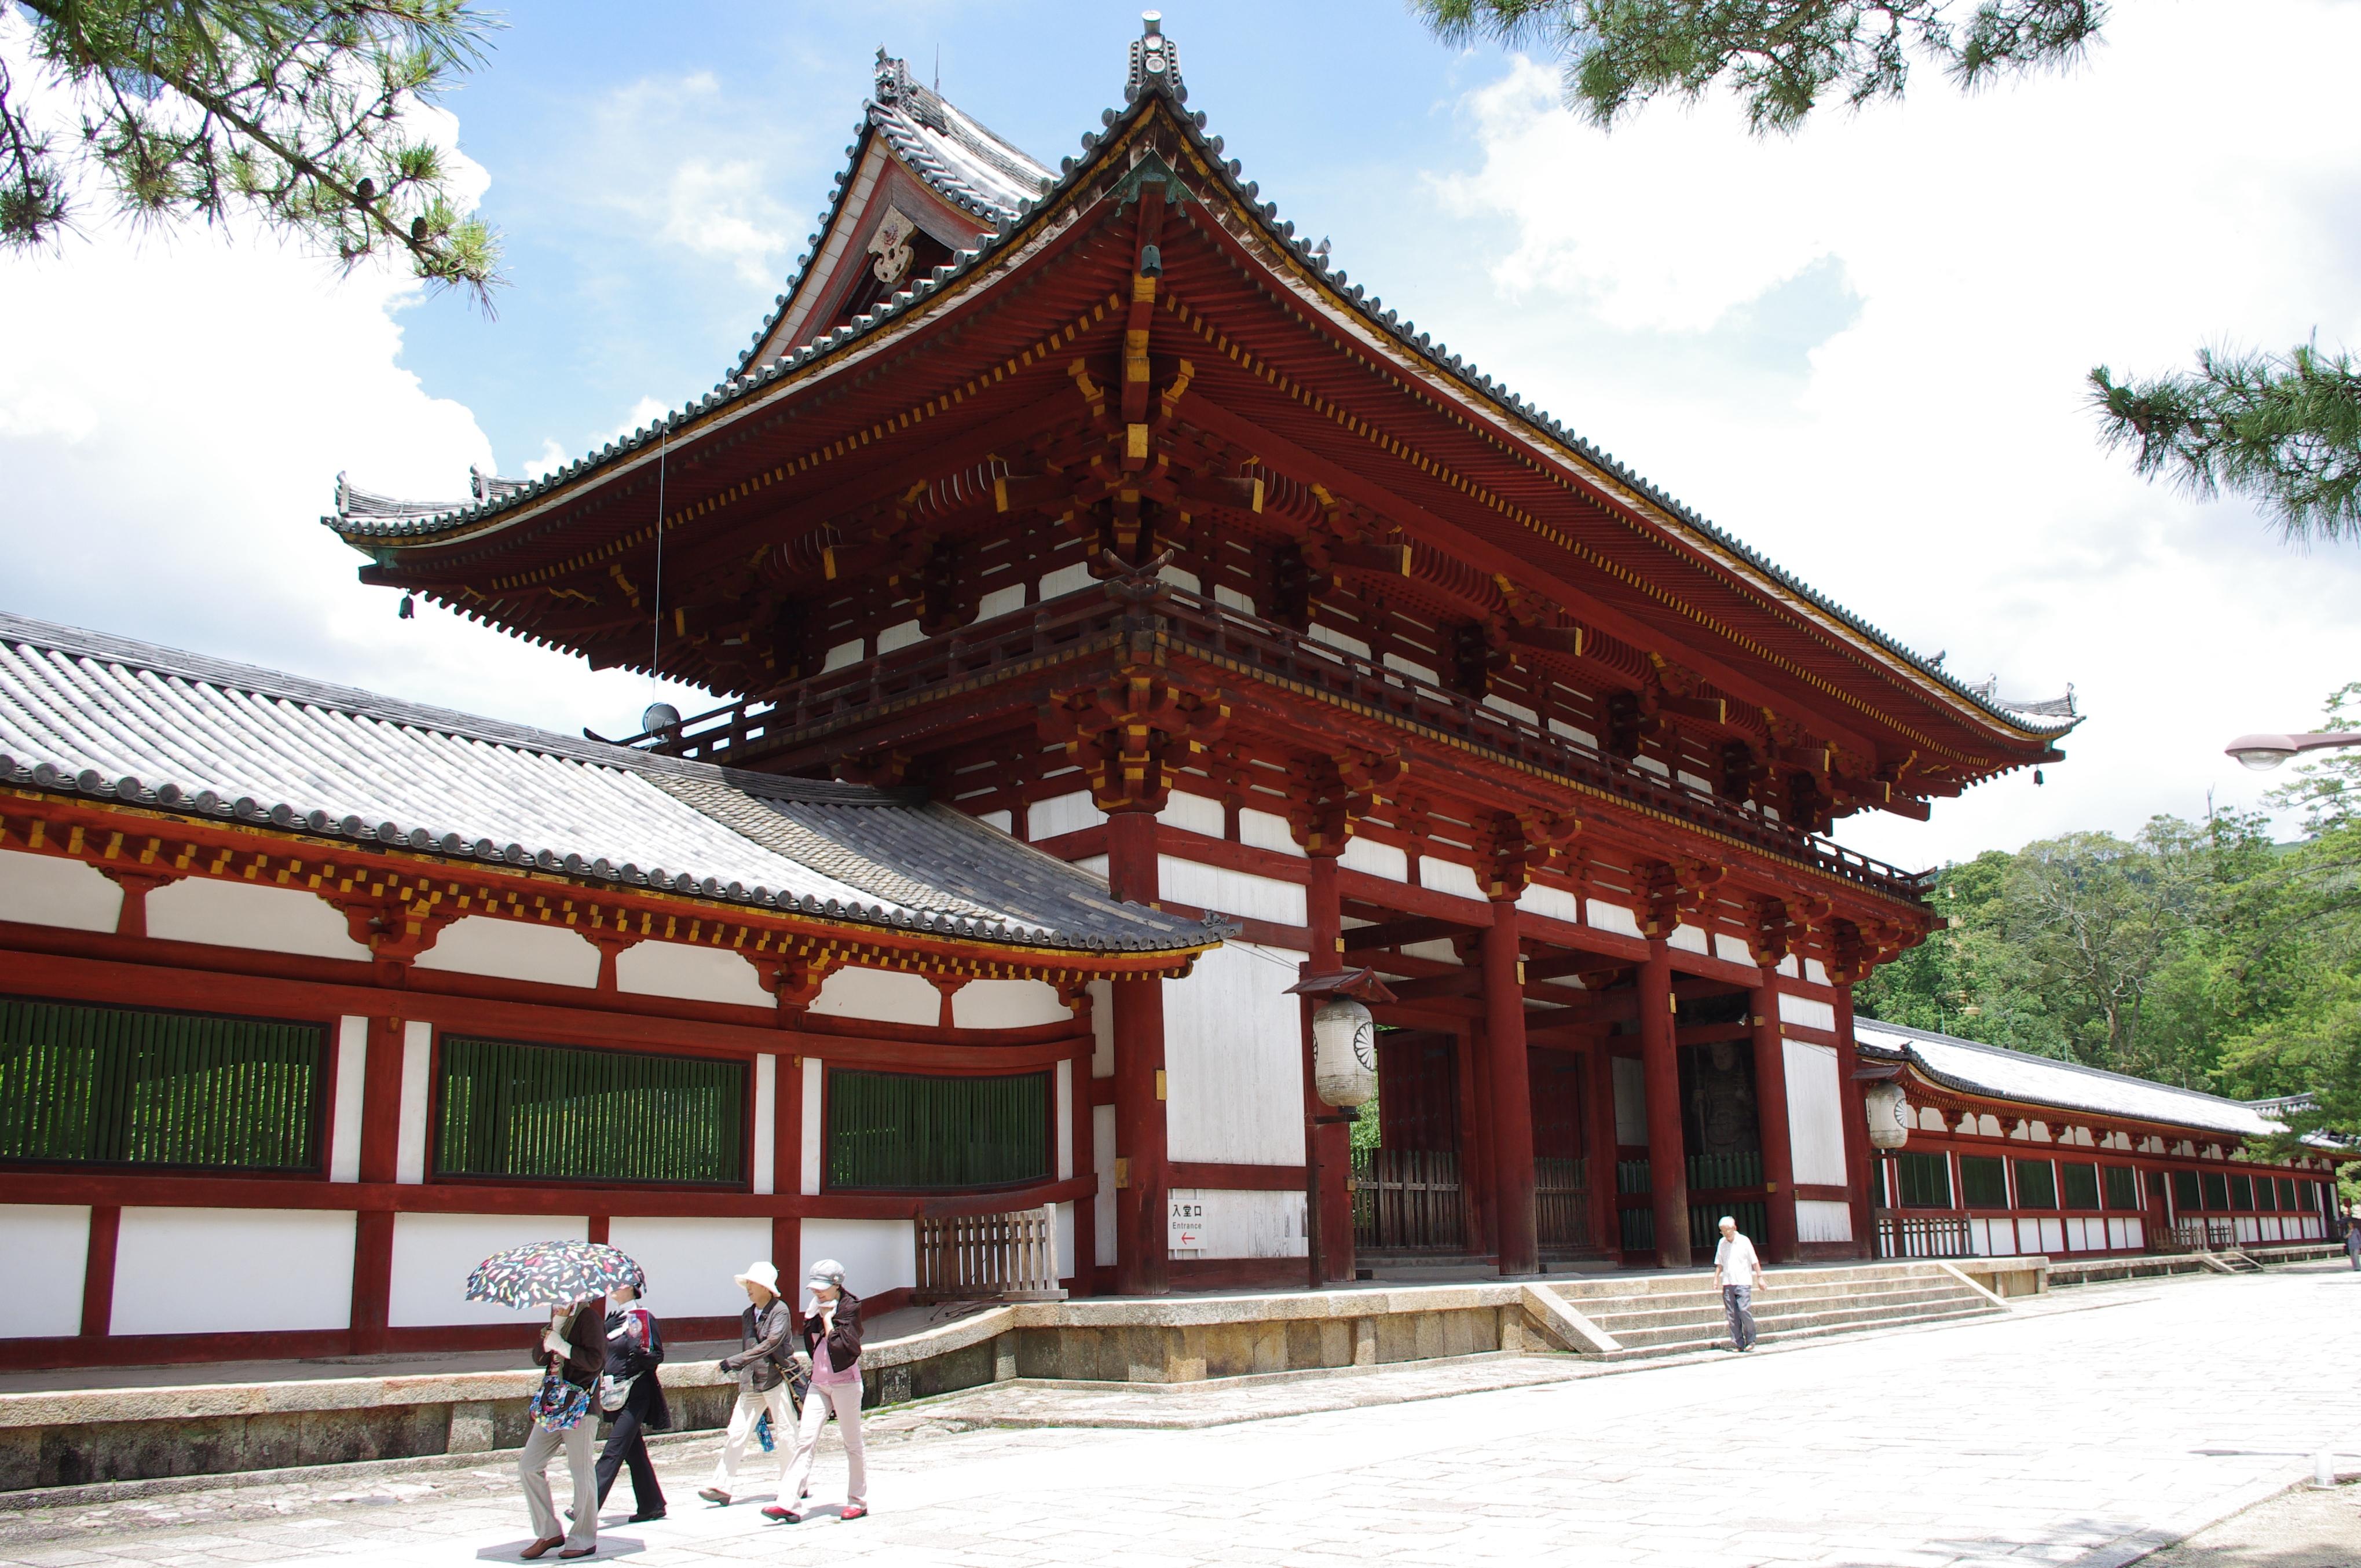 File:20100716 Nara Todaiji 2271.jpg - Wikimedia Commons